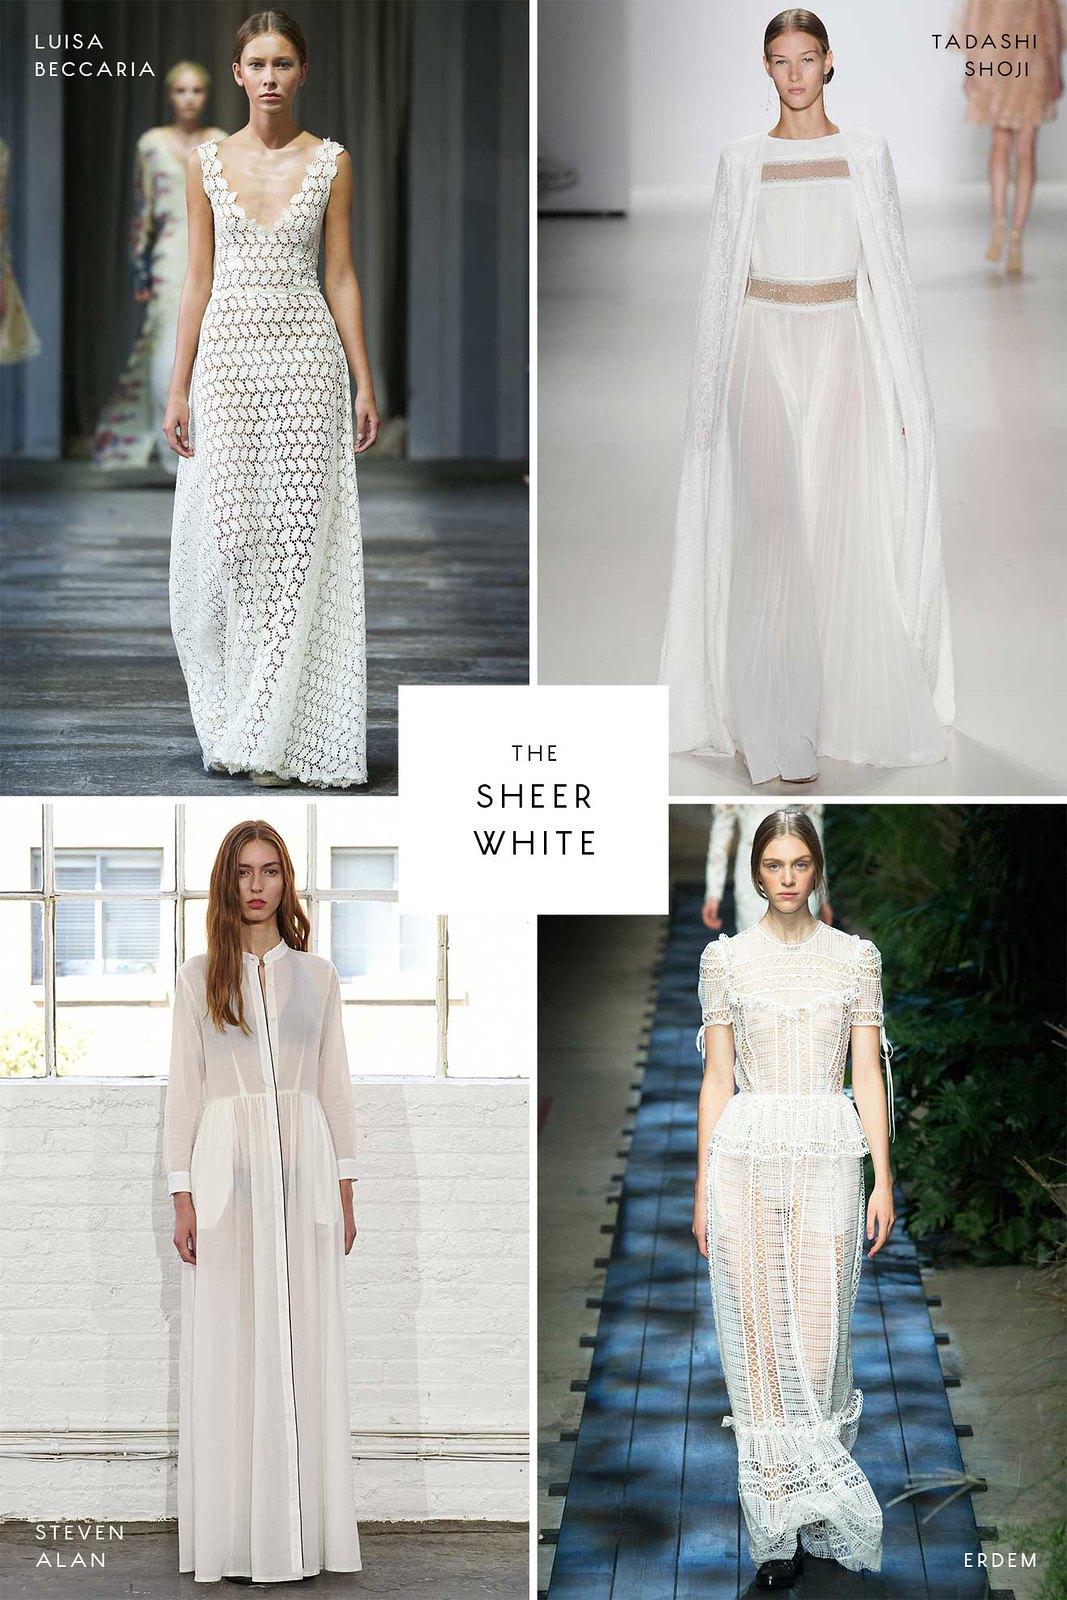 miss-moss-ss15-sheer-white